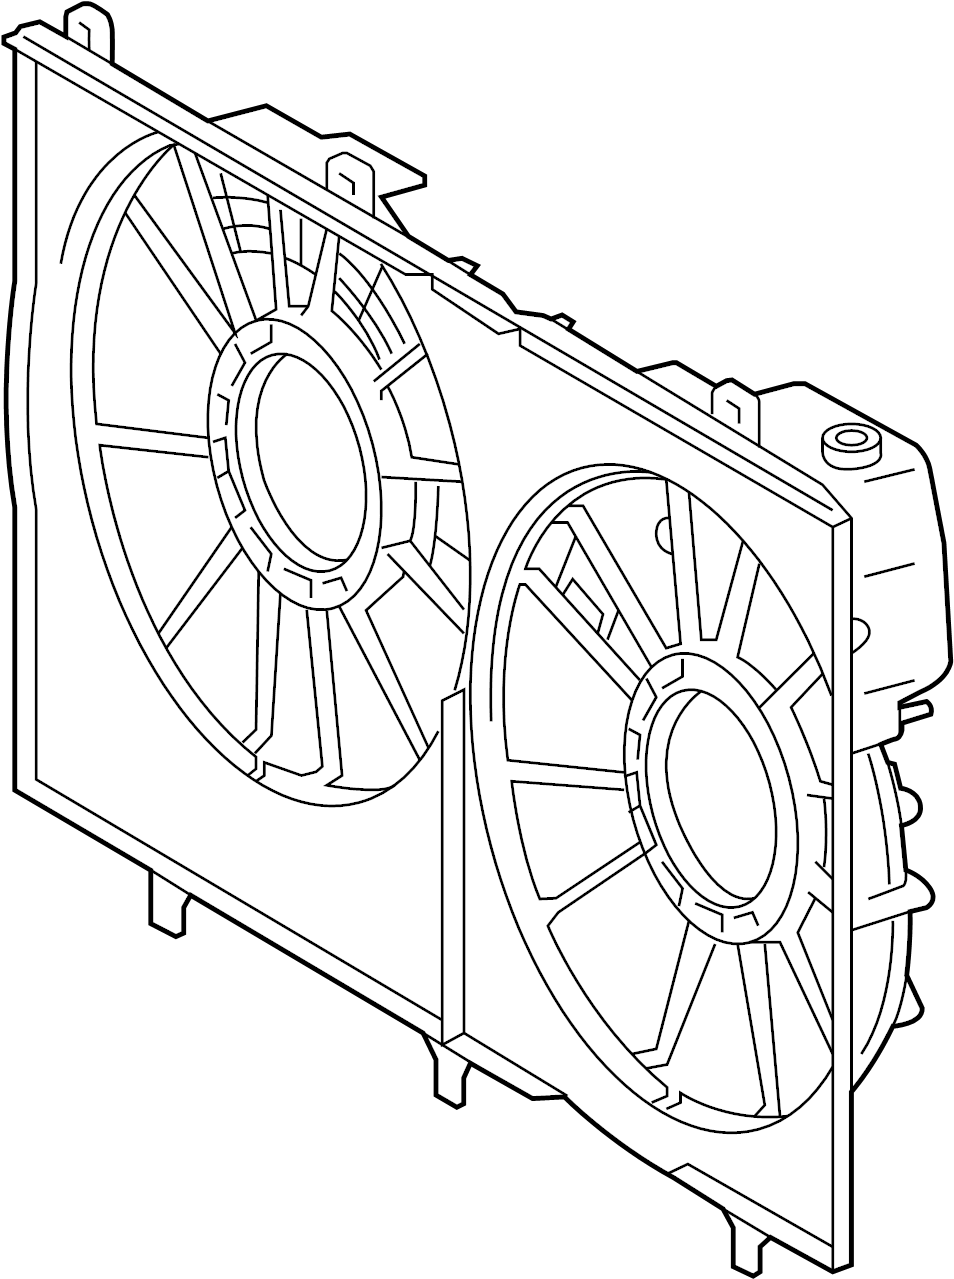 Toyota Highlander Engine Cooling Fan Shroud. RADIATOR